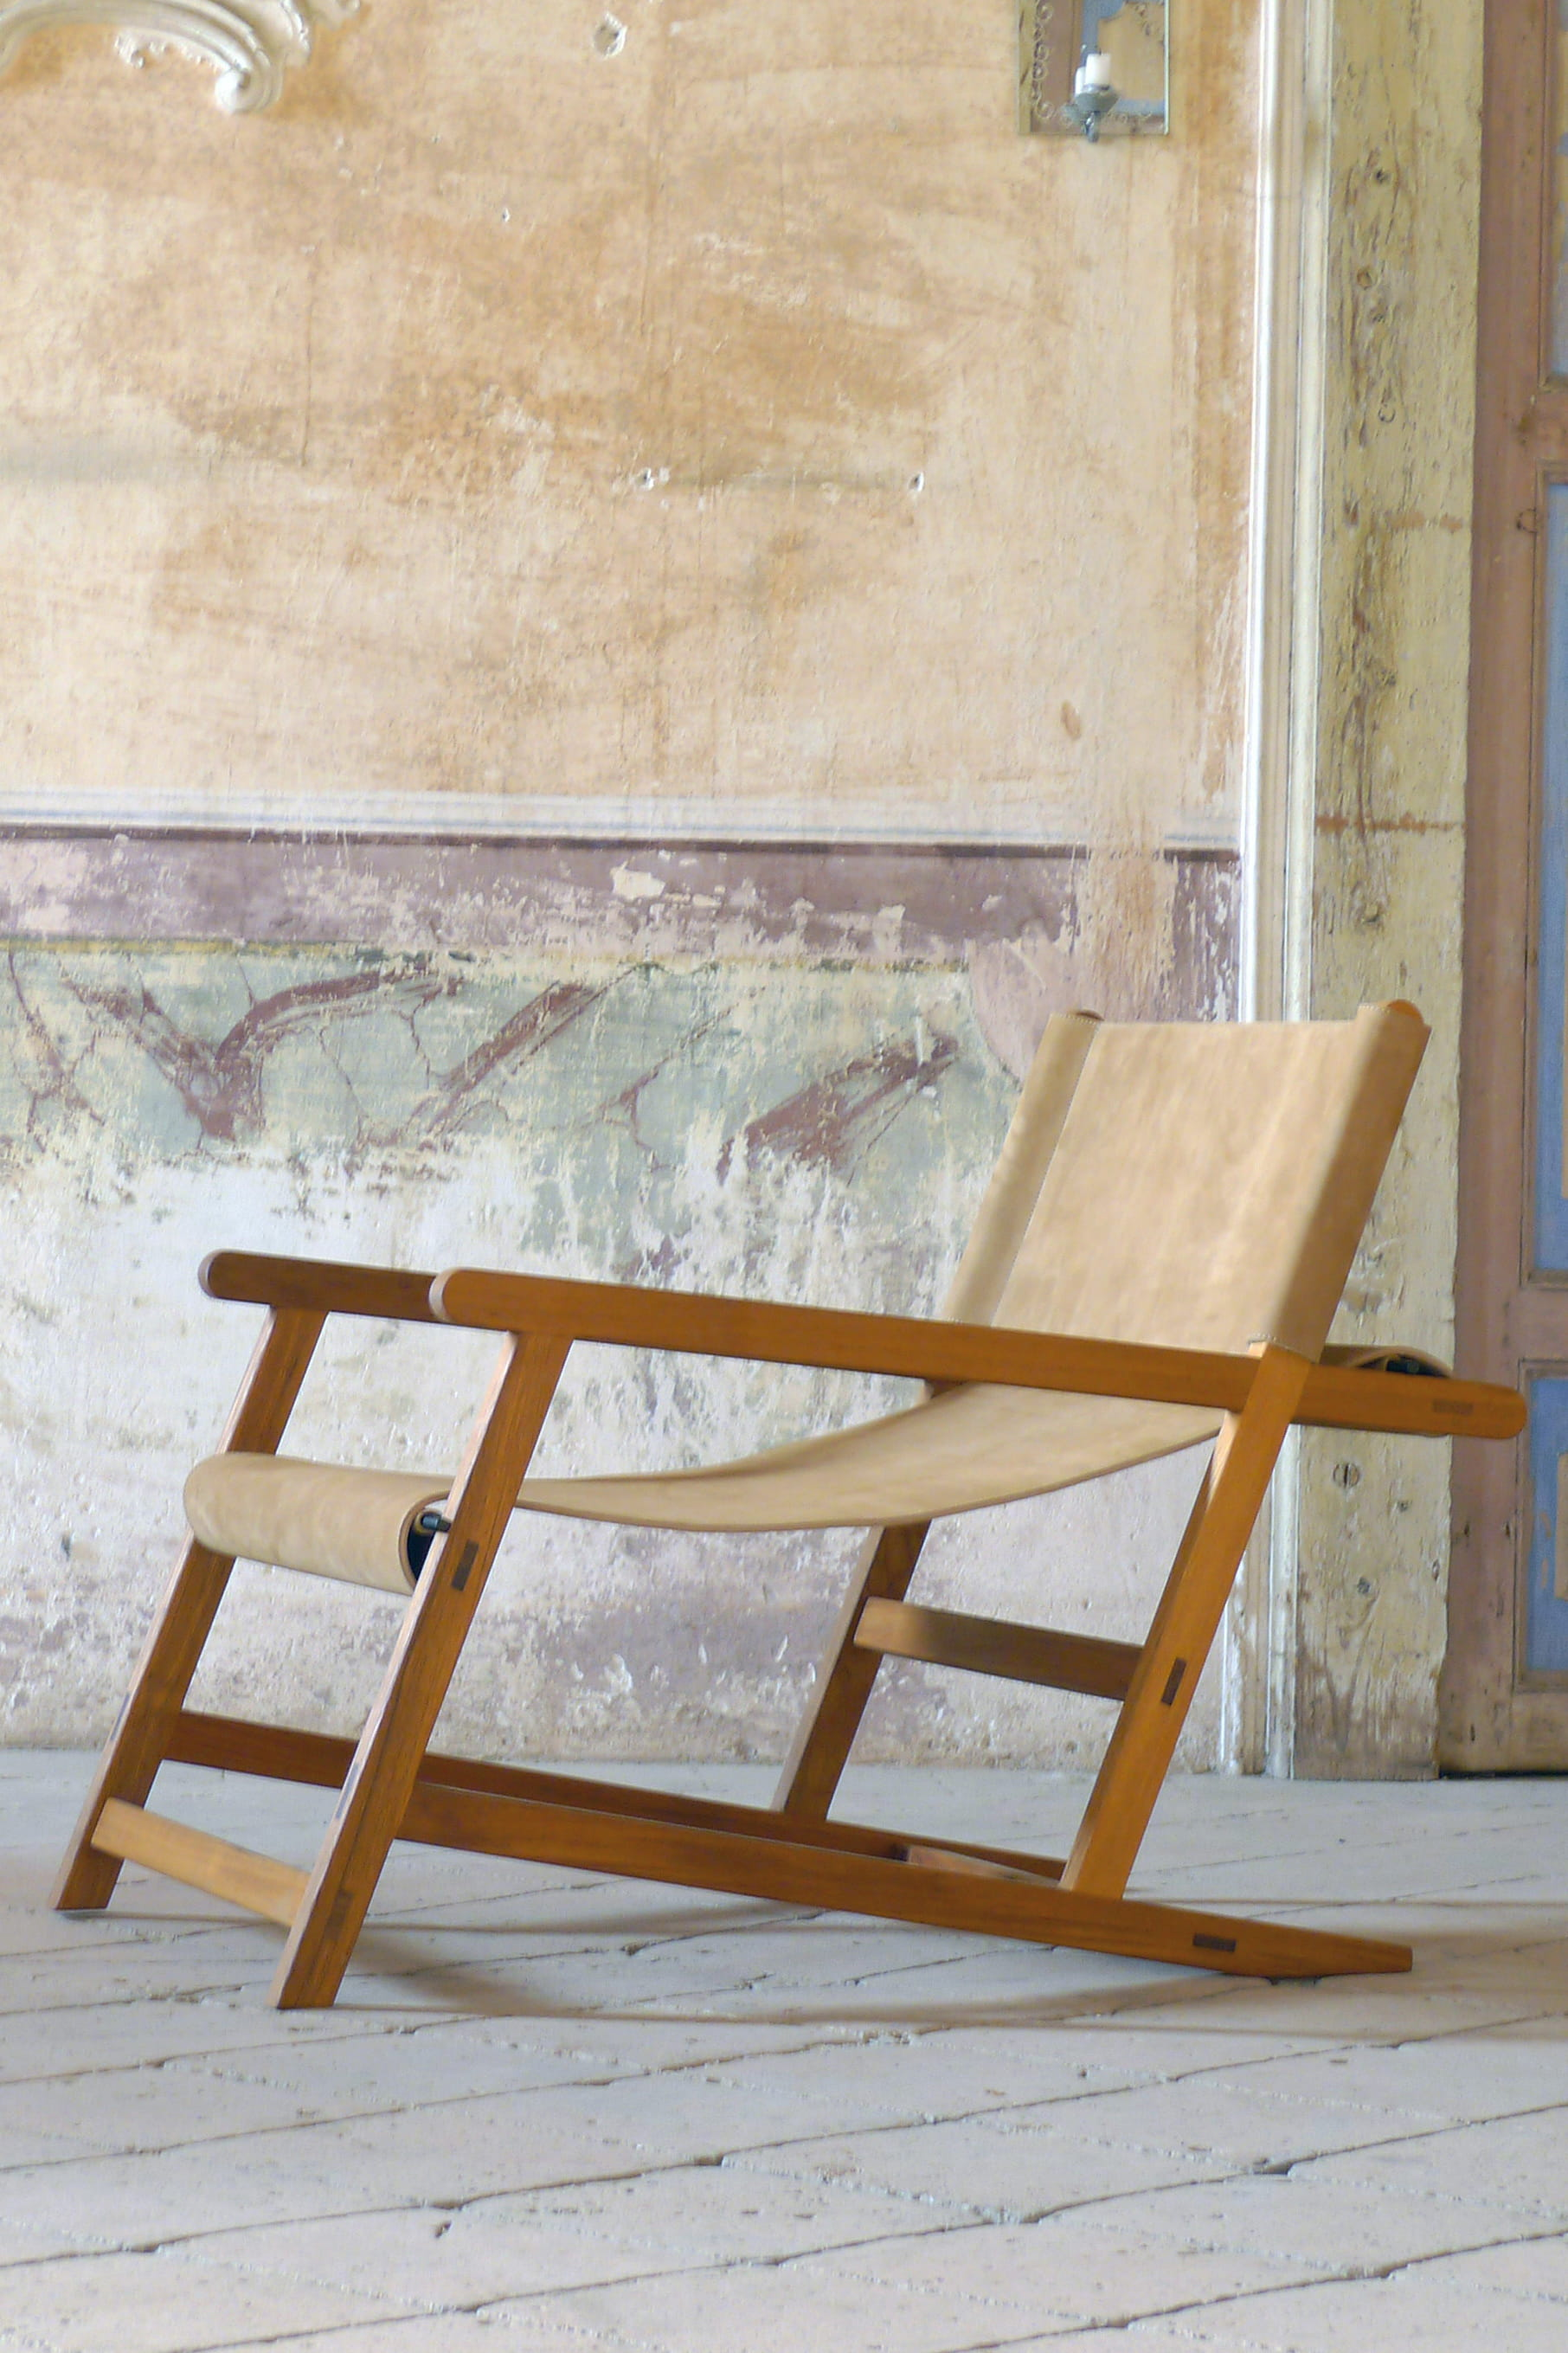 chaise longue hanbury chez conran shop. Black Bedroom Furniture Sets. Home Design Ideas